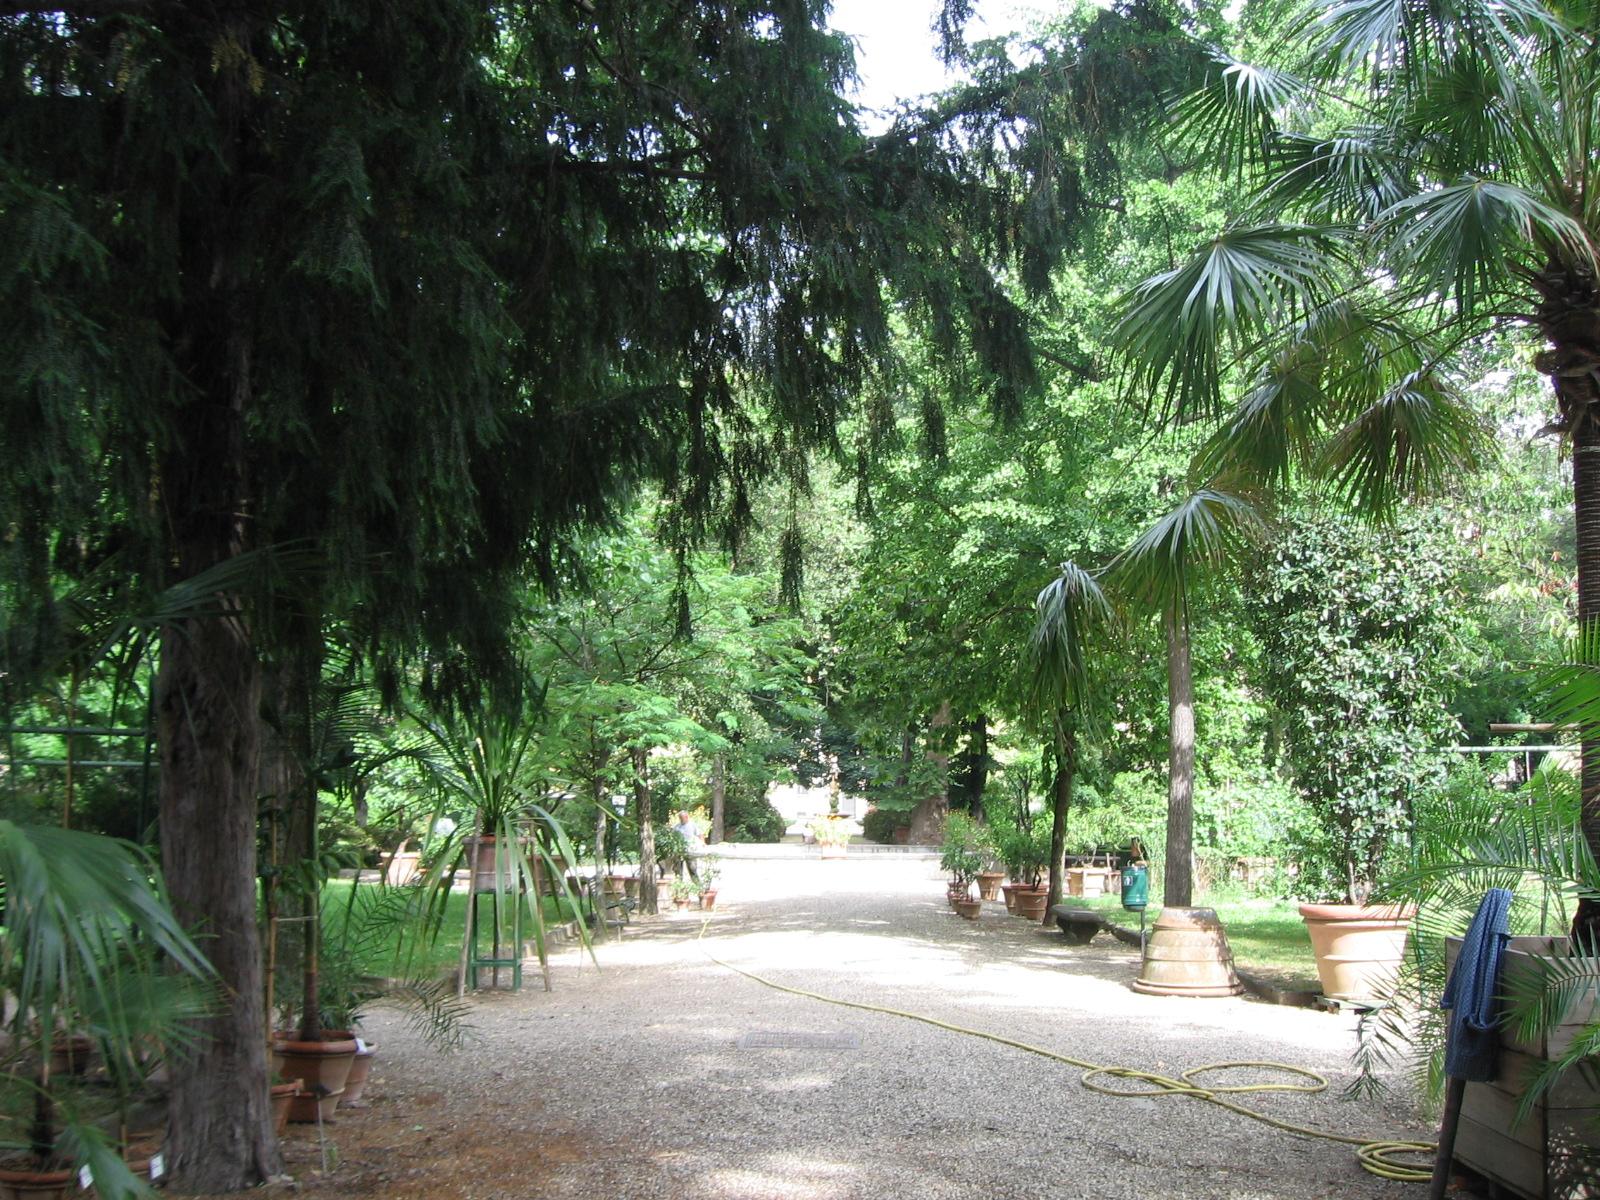 Firenze giardini da visitare assolutamente u te la do io firenze